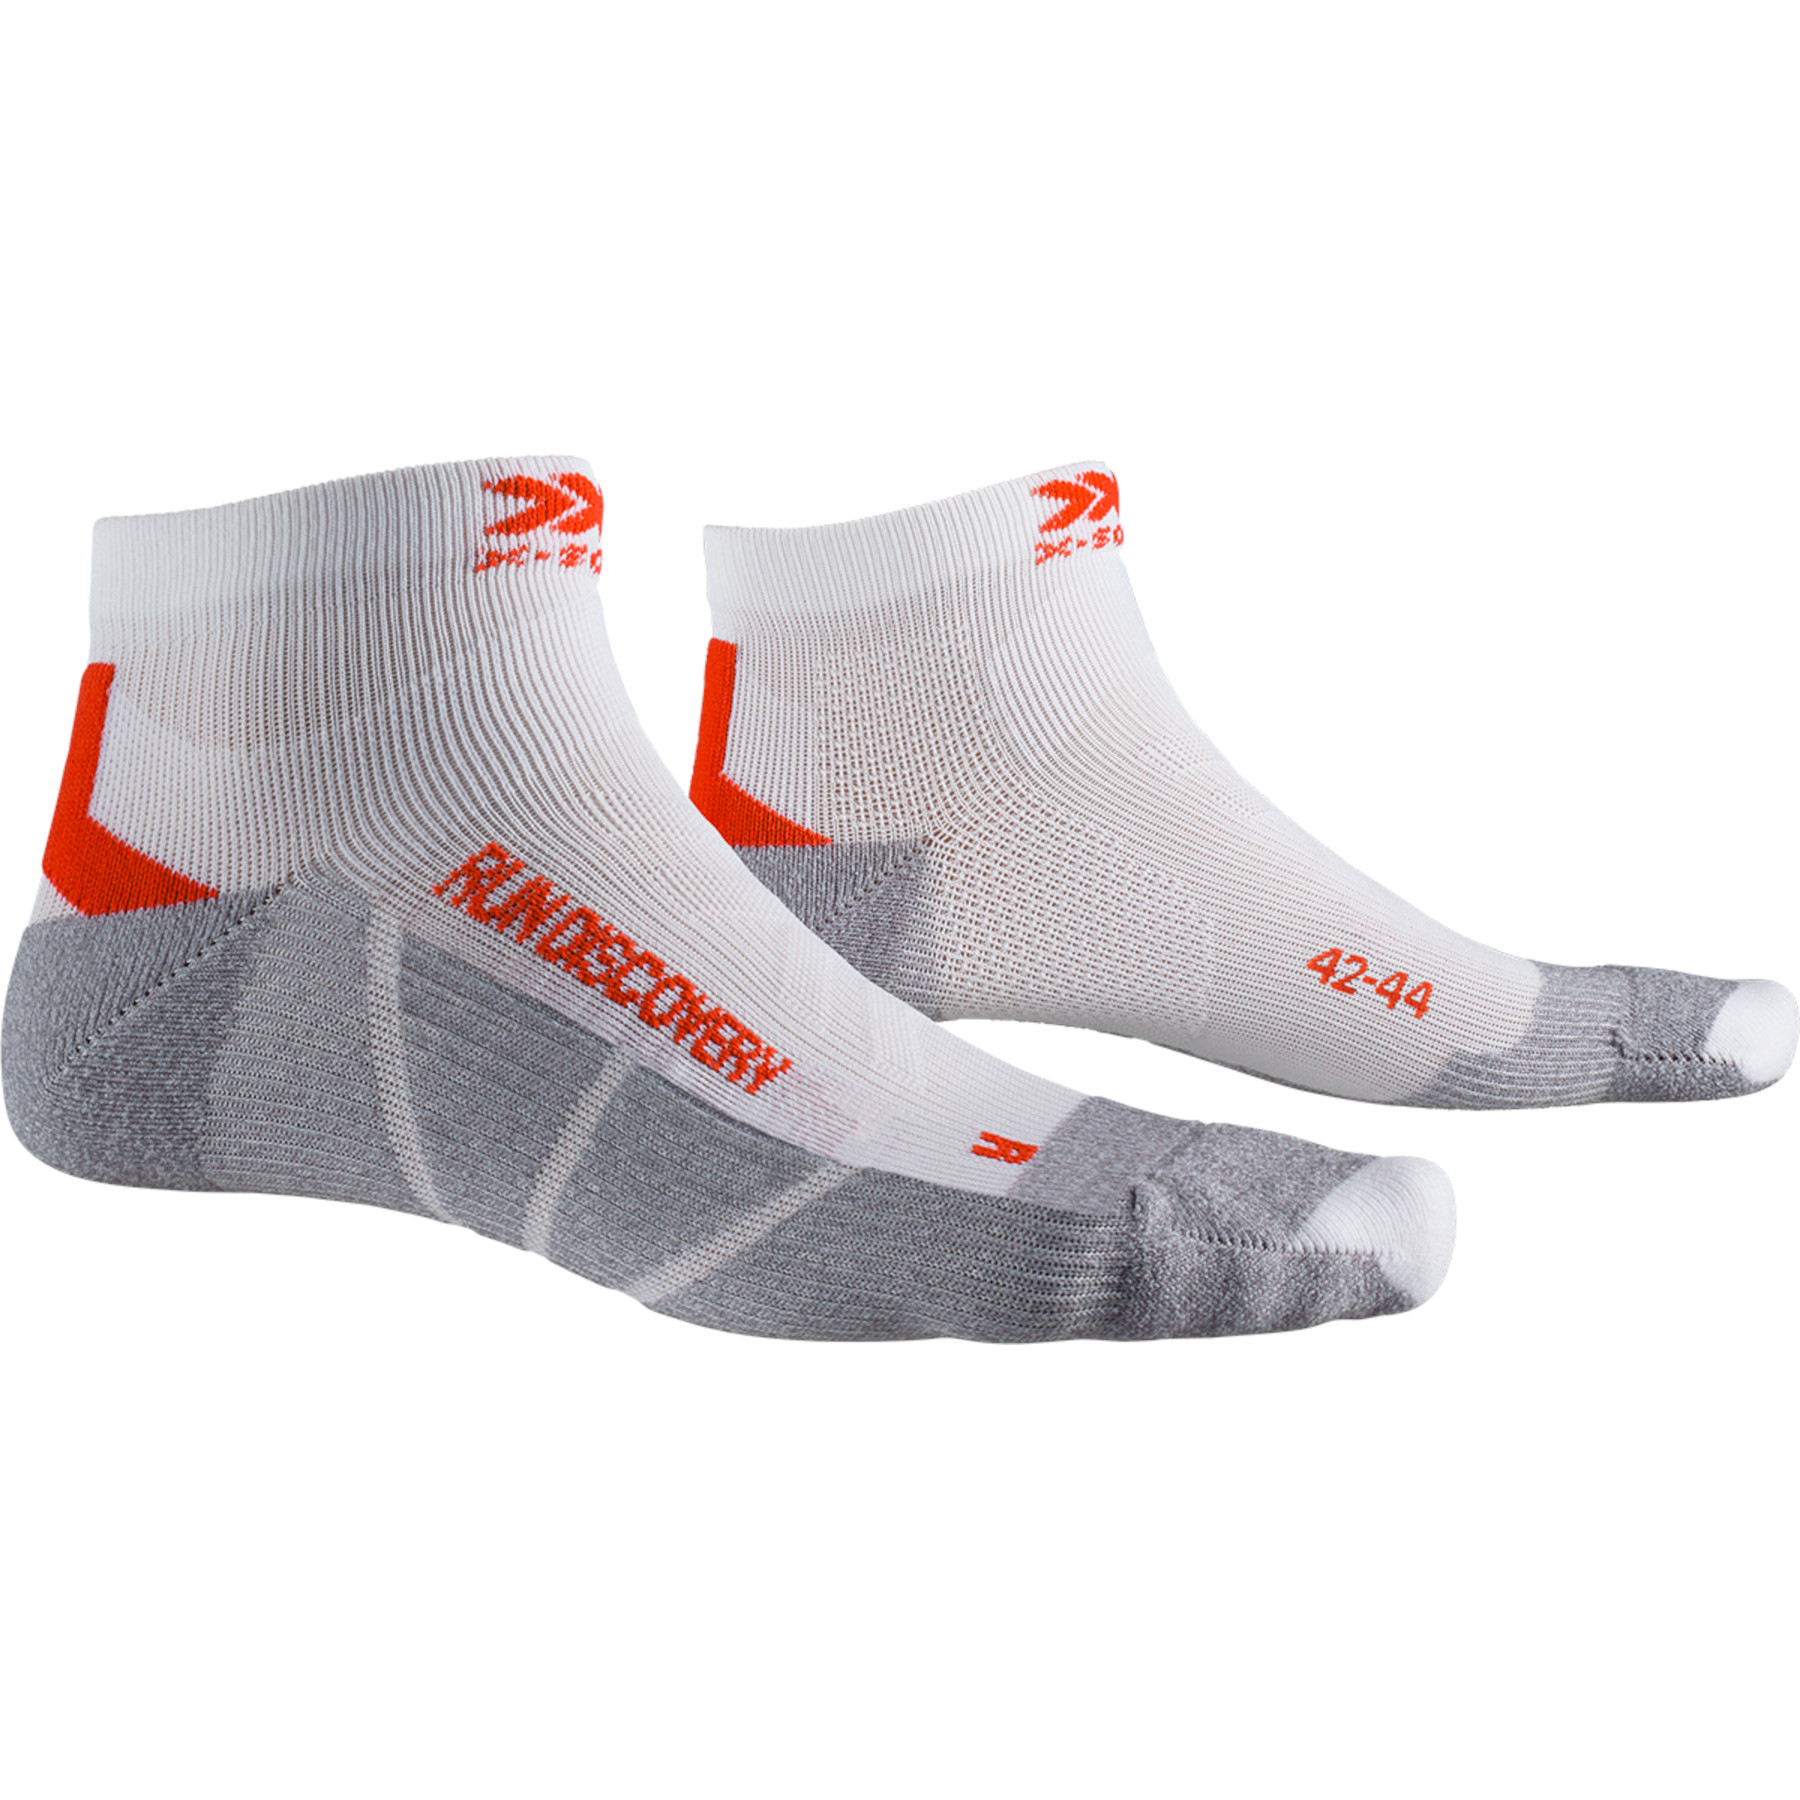 X-Socks Run Discovery Laufsocken - arctic white/dolomite grey